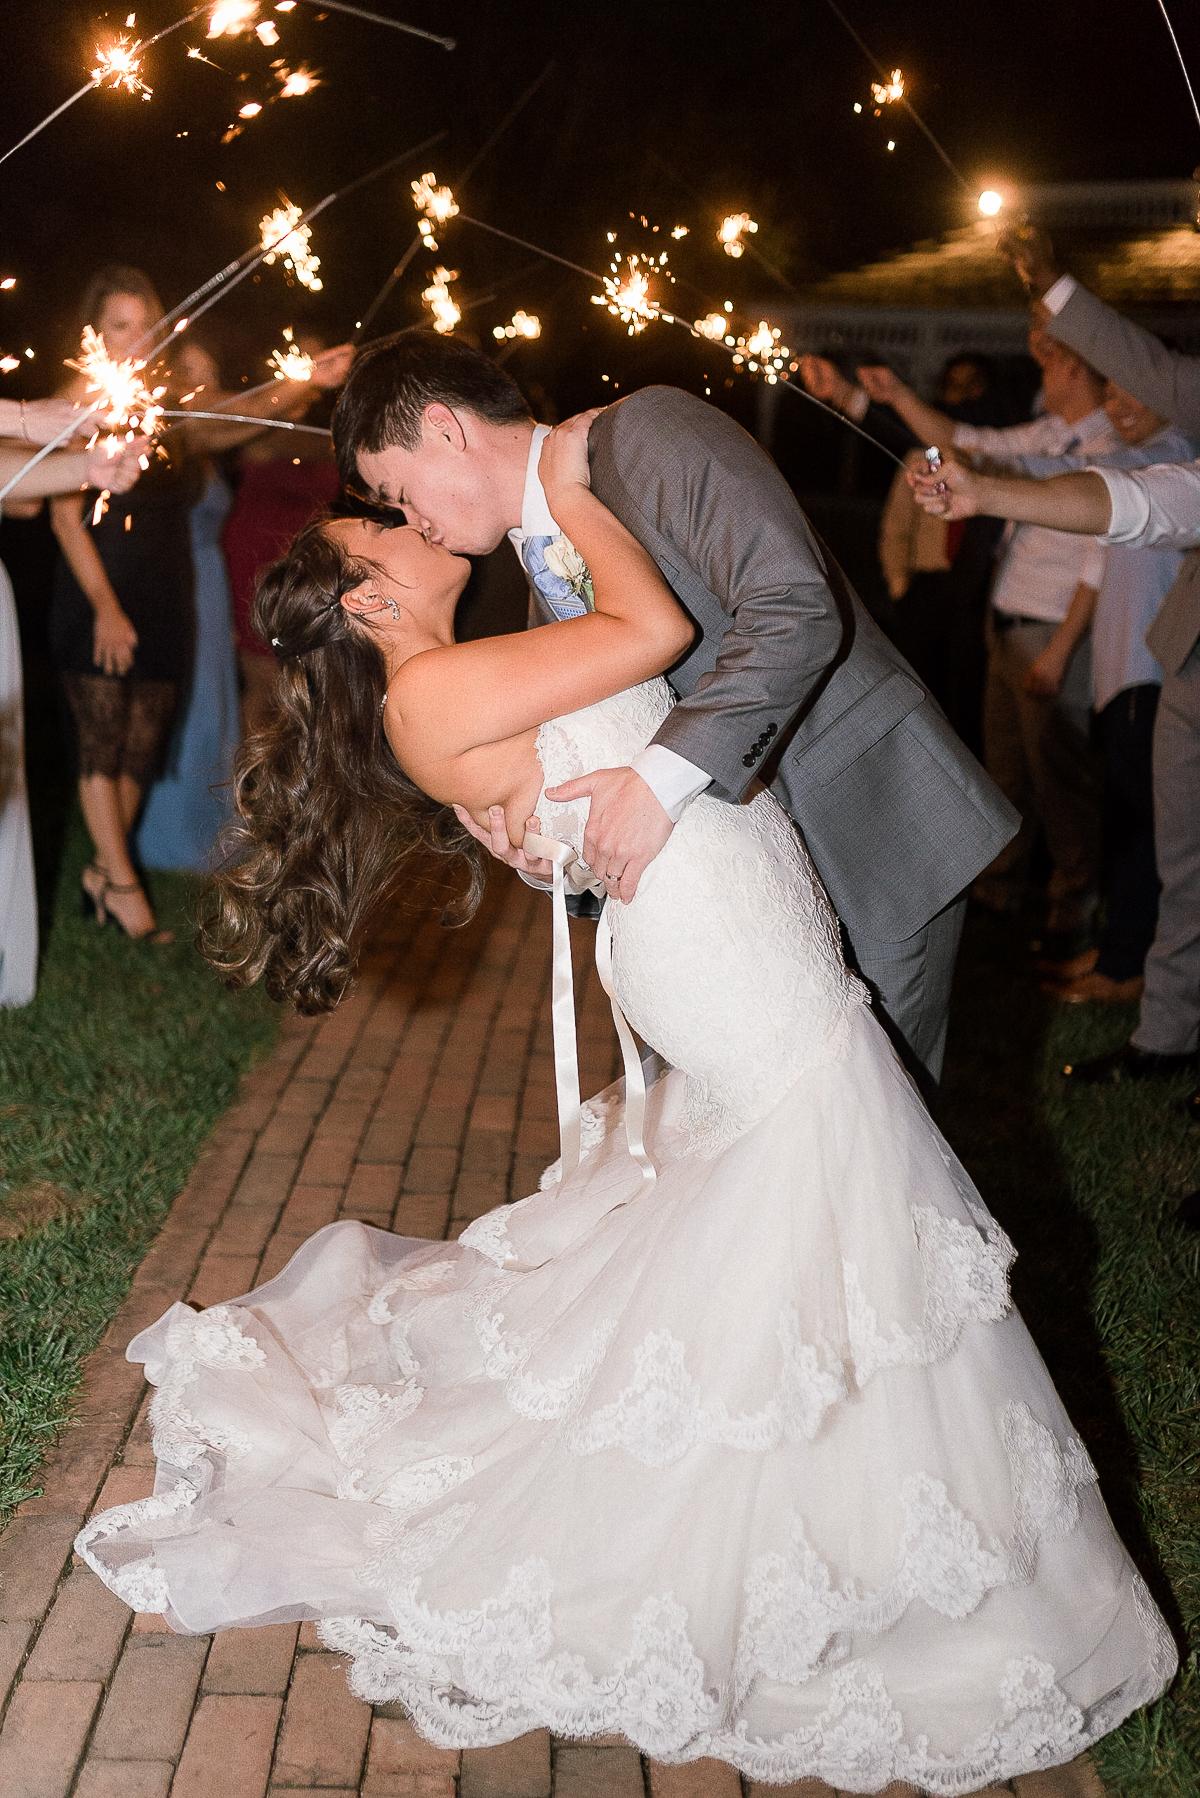 MD-Walkers-Overlook-Wedding-Bride-Get-Ready-134.jpg